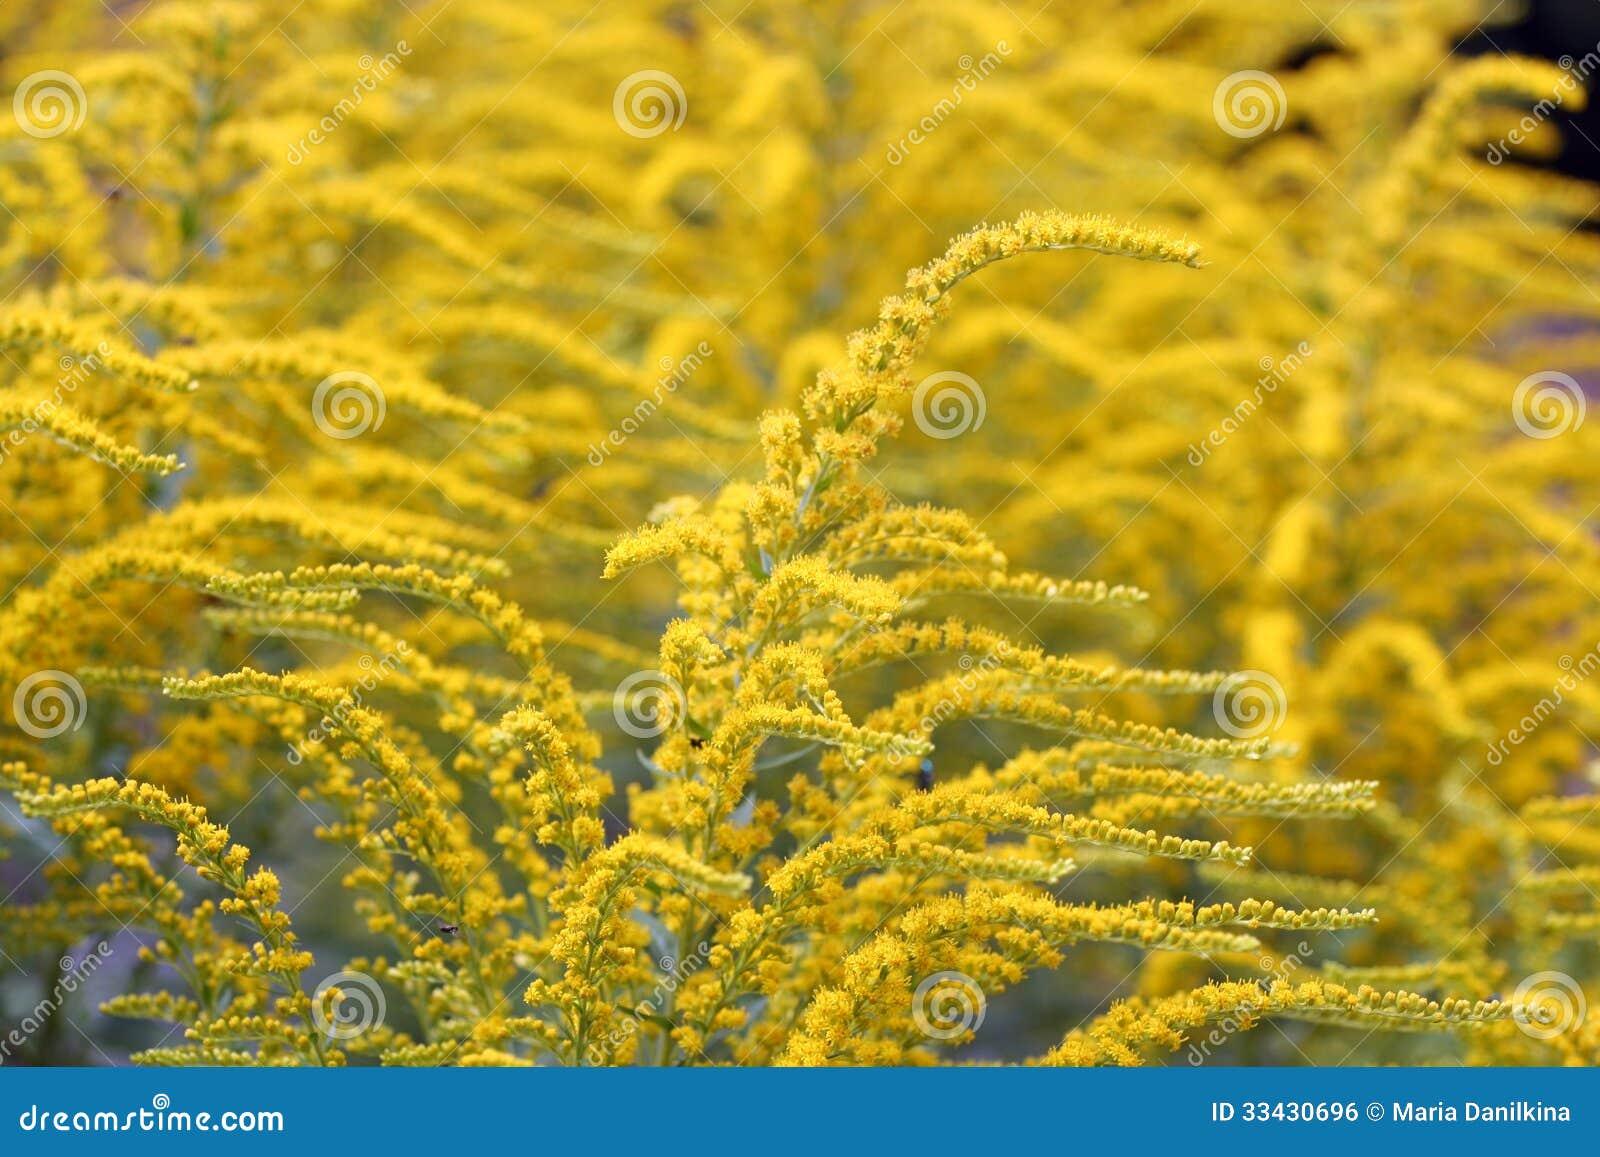 gelbe sommerblumen lizenzfreies stockbild bild 33430696. Black Bedroom Furniture Sets. Home Design Ideas